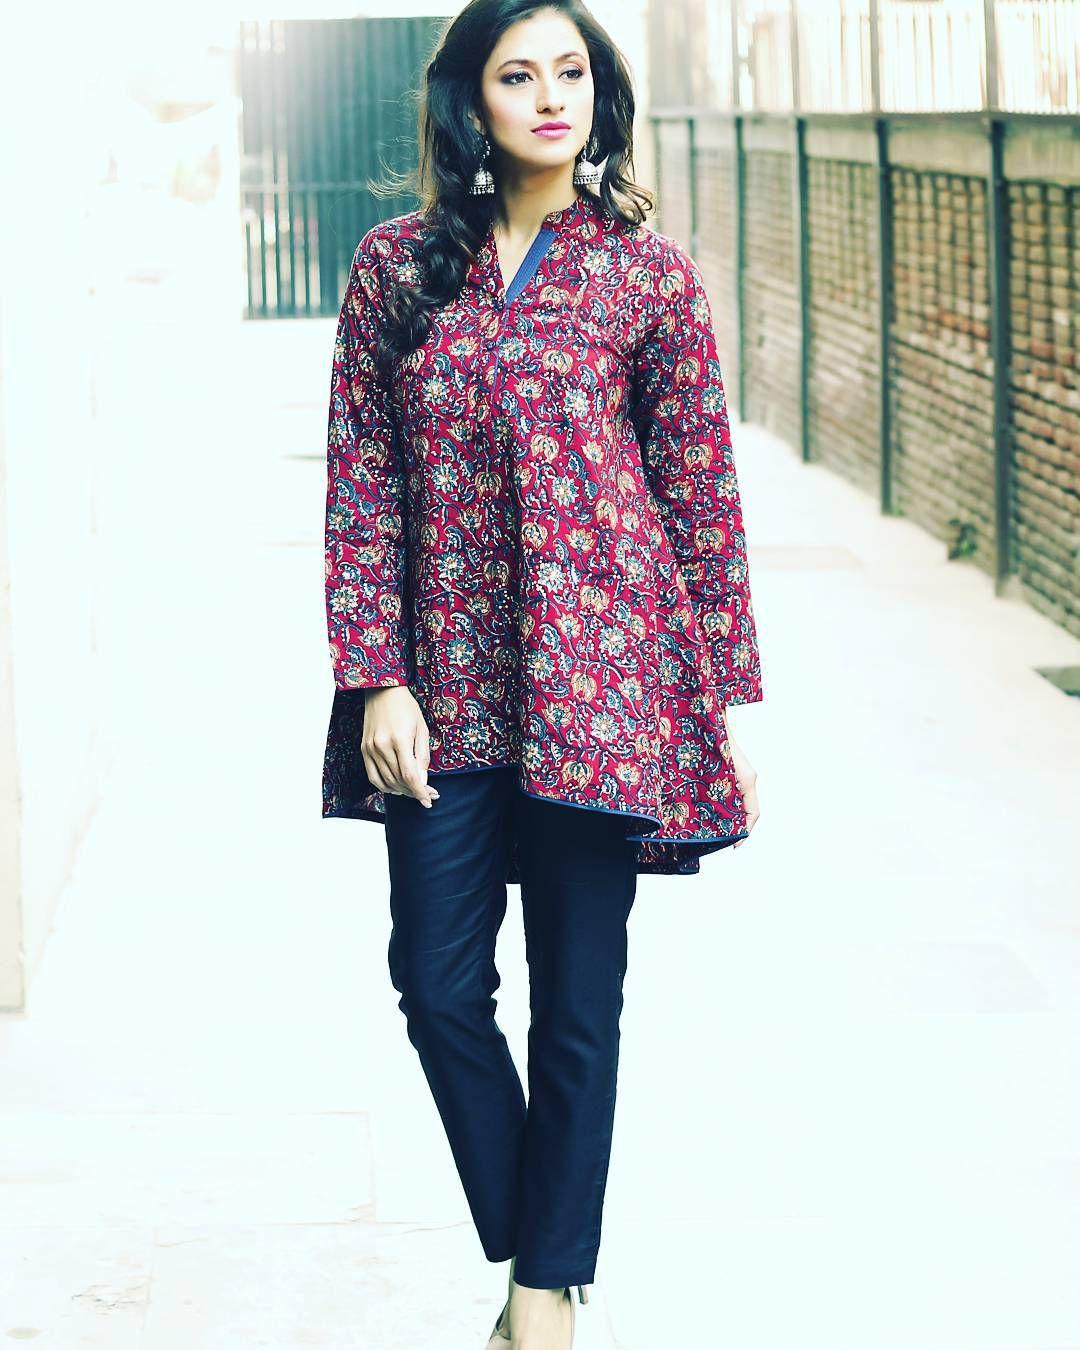 """#Cotton #Floral #Elegant #Flowy #Design #Pattern #Dark #Pants #Jhumka #Silver #Earrings #Beige #Accessories #Fashion #Trend #Fabindia #Festive #Shopping…"""